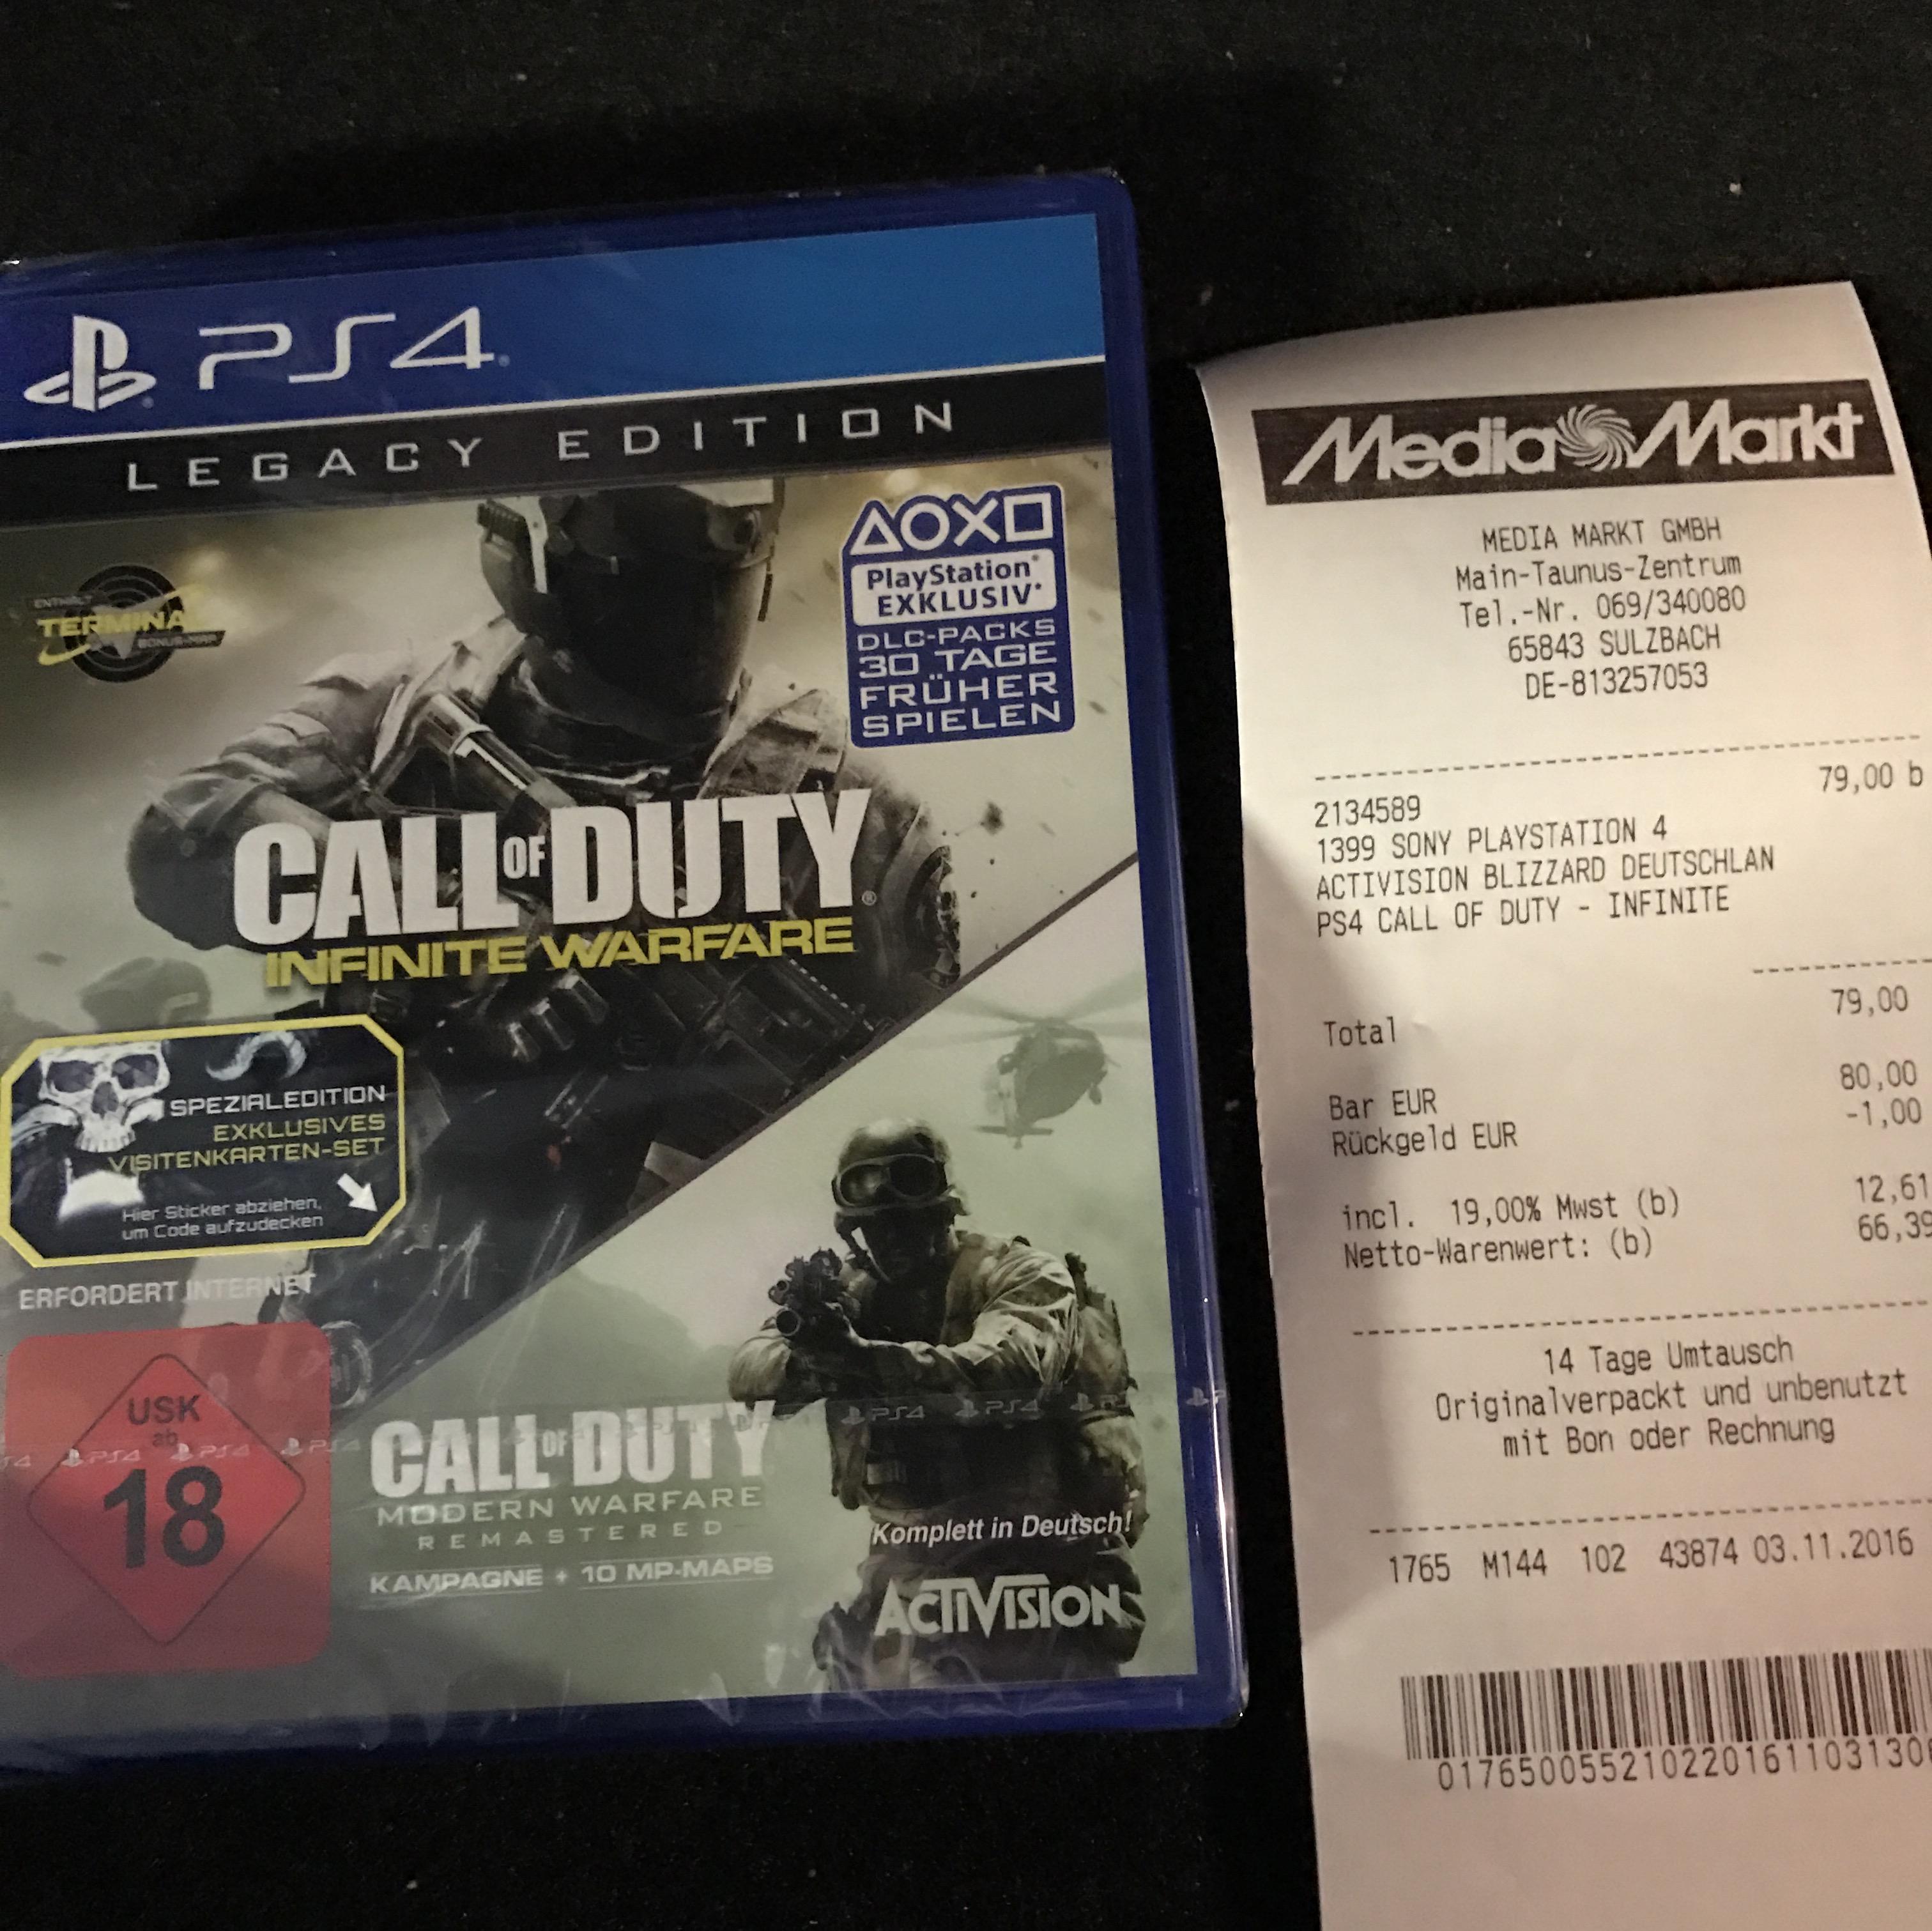 [LOKAL SULZBACH/MTZ]Call of Duty Infinite Warfare Legacy Edition Ps4 79,00 ab sofort im MTZ!!!!